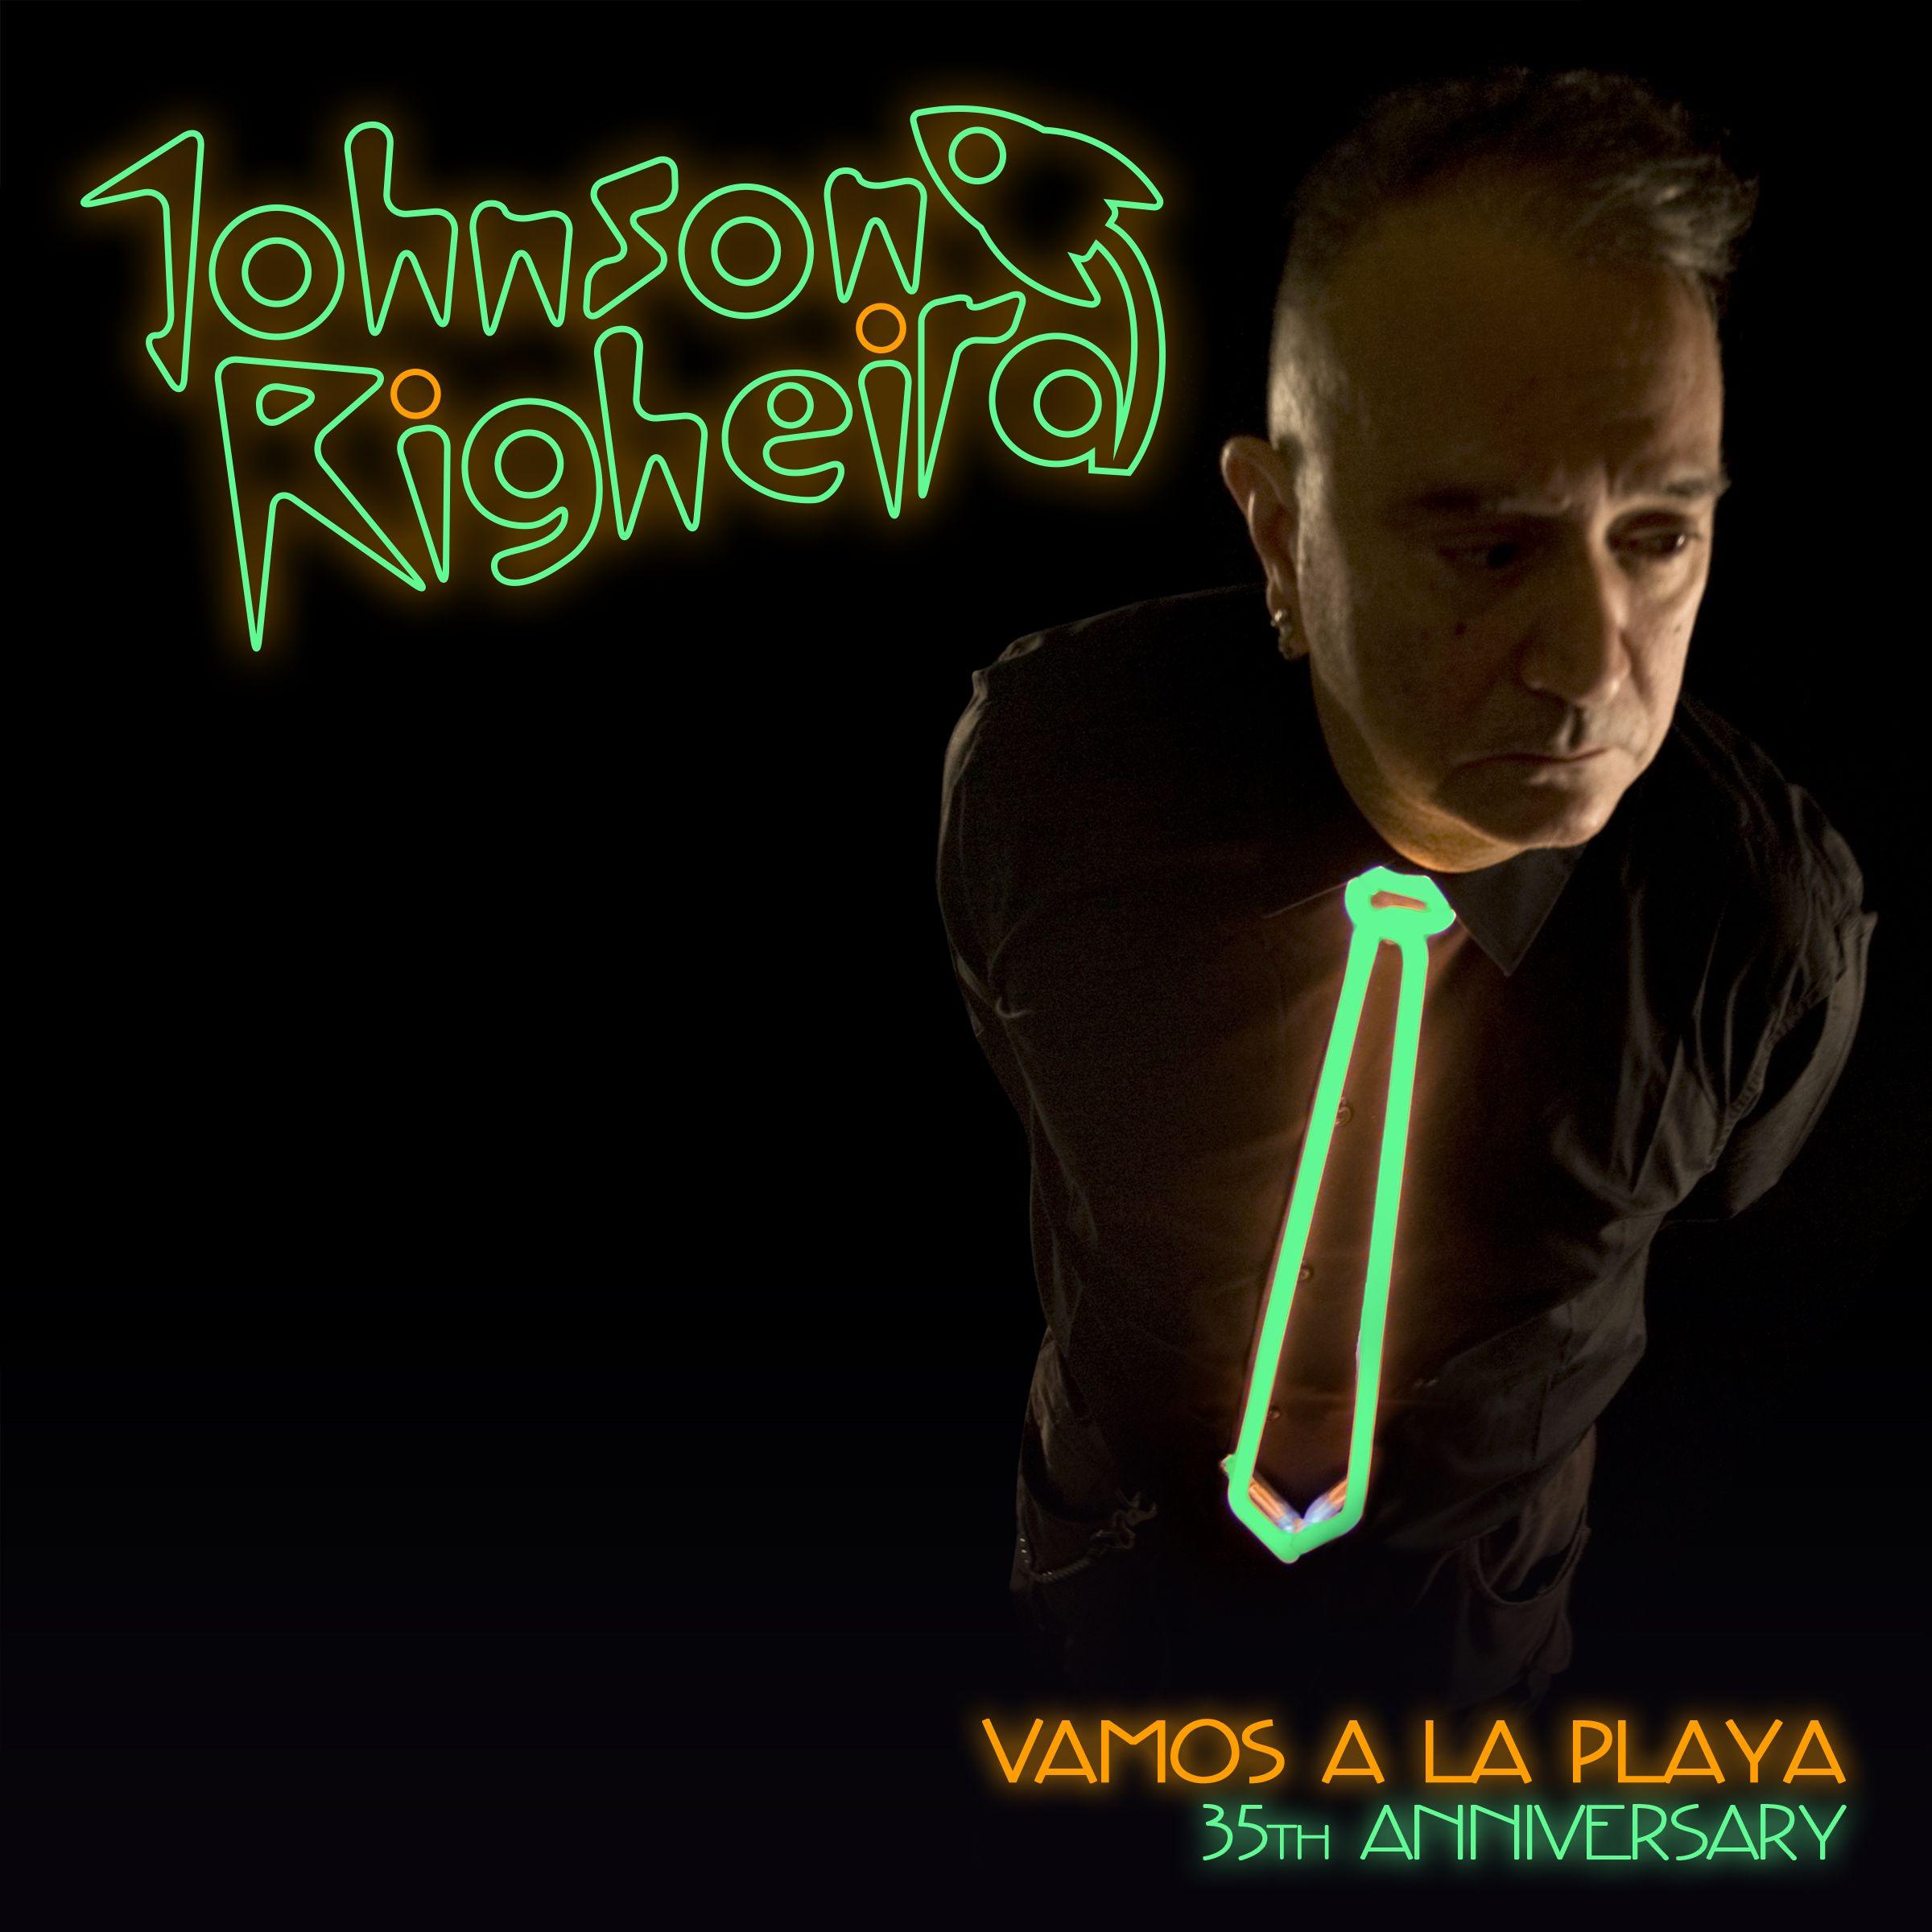 opcm_tde_12_001_johnson_righeira_-_vamos_a_la_playa_-_35th_anniversary.jpg